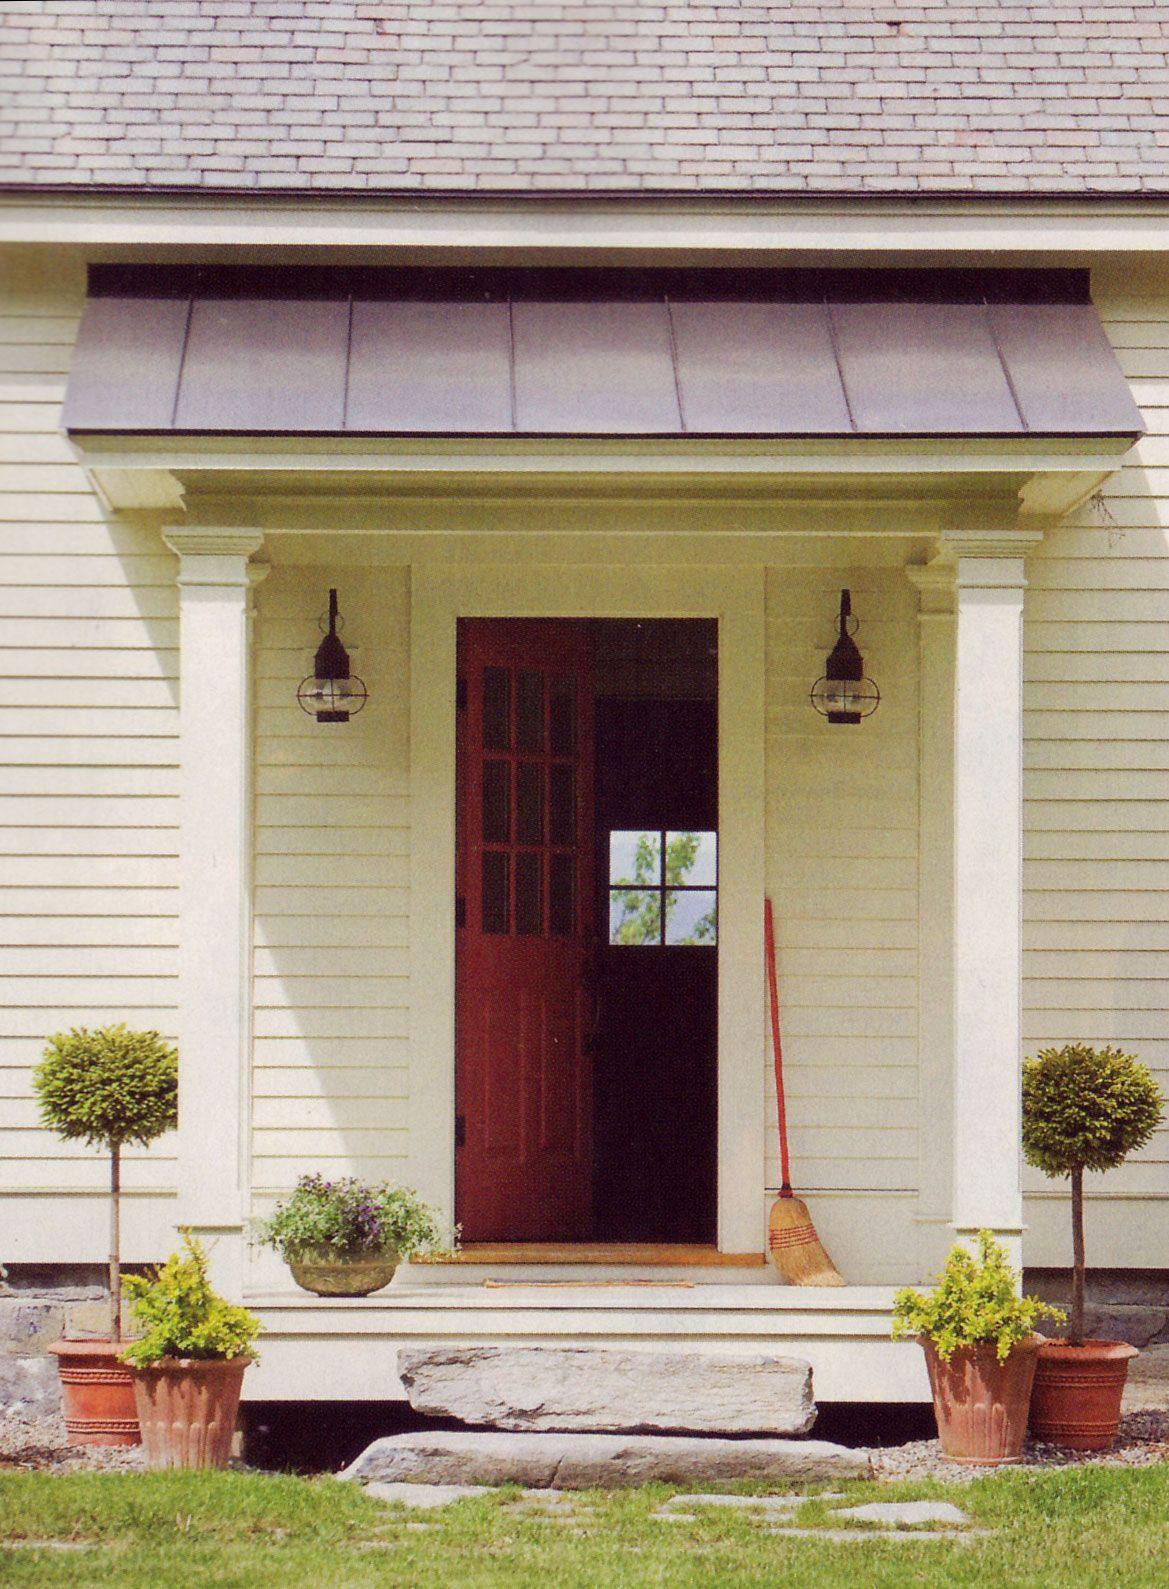 Back Porch Dream House Front Porch Wood Exterior